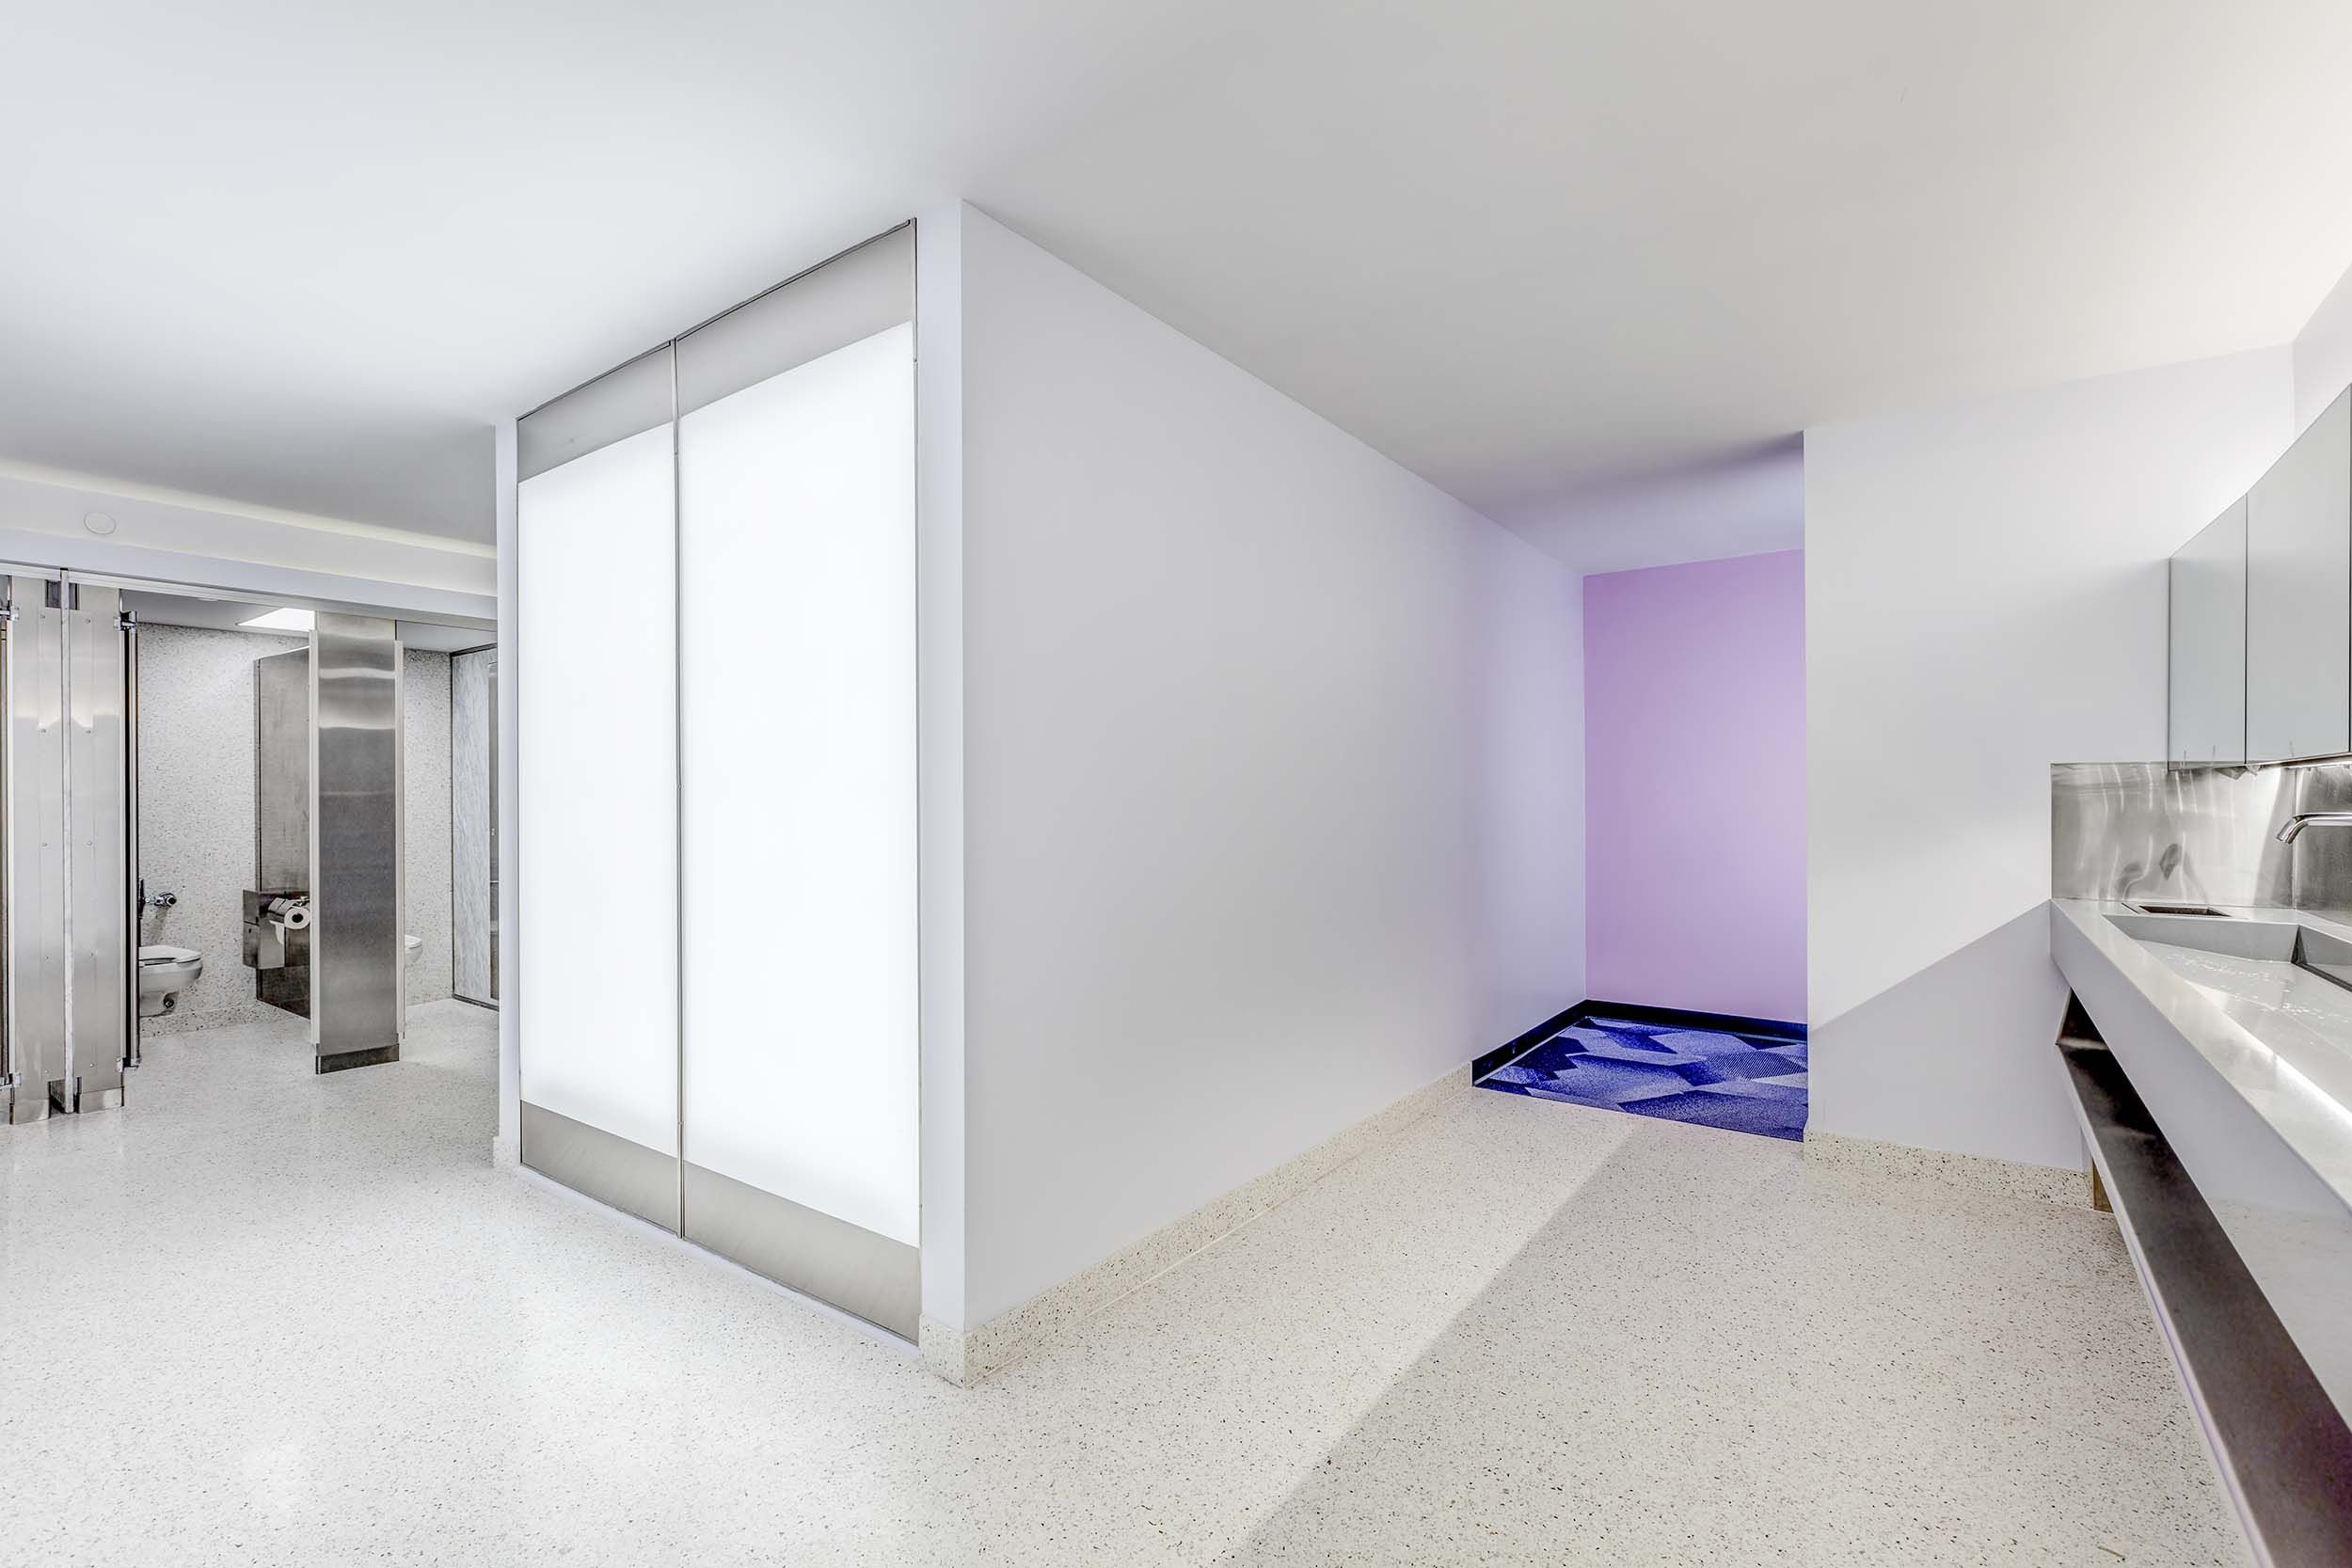 Solstice_Architects_Van_Wezel_02.jpg